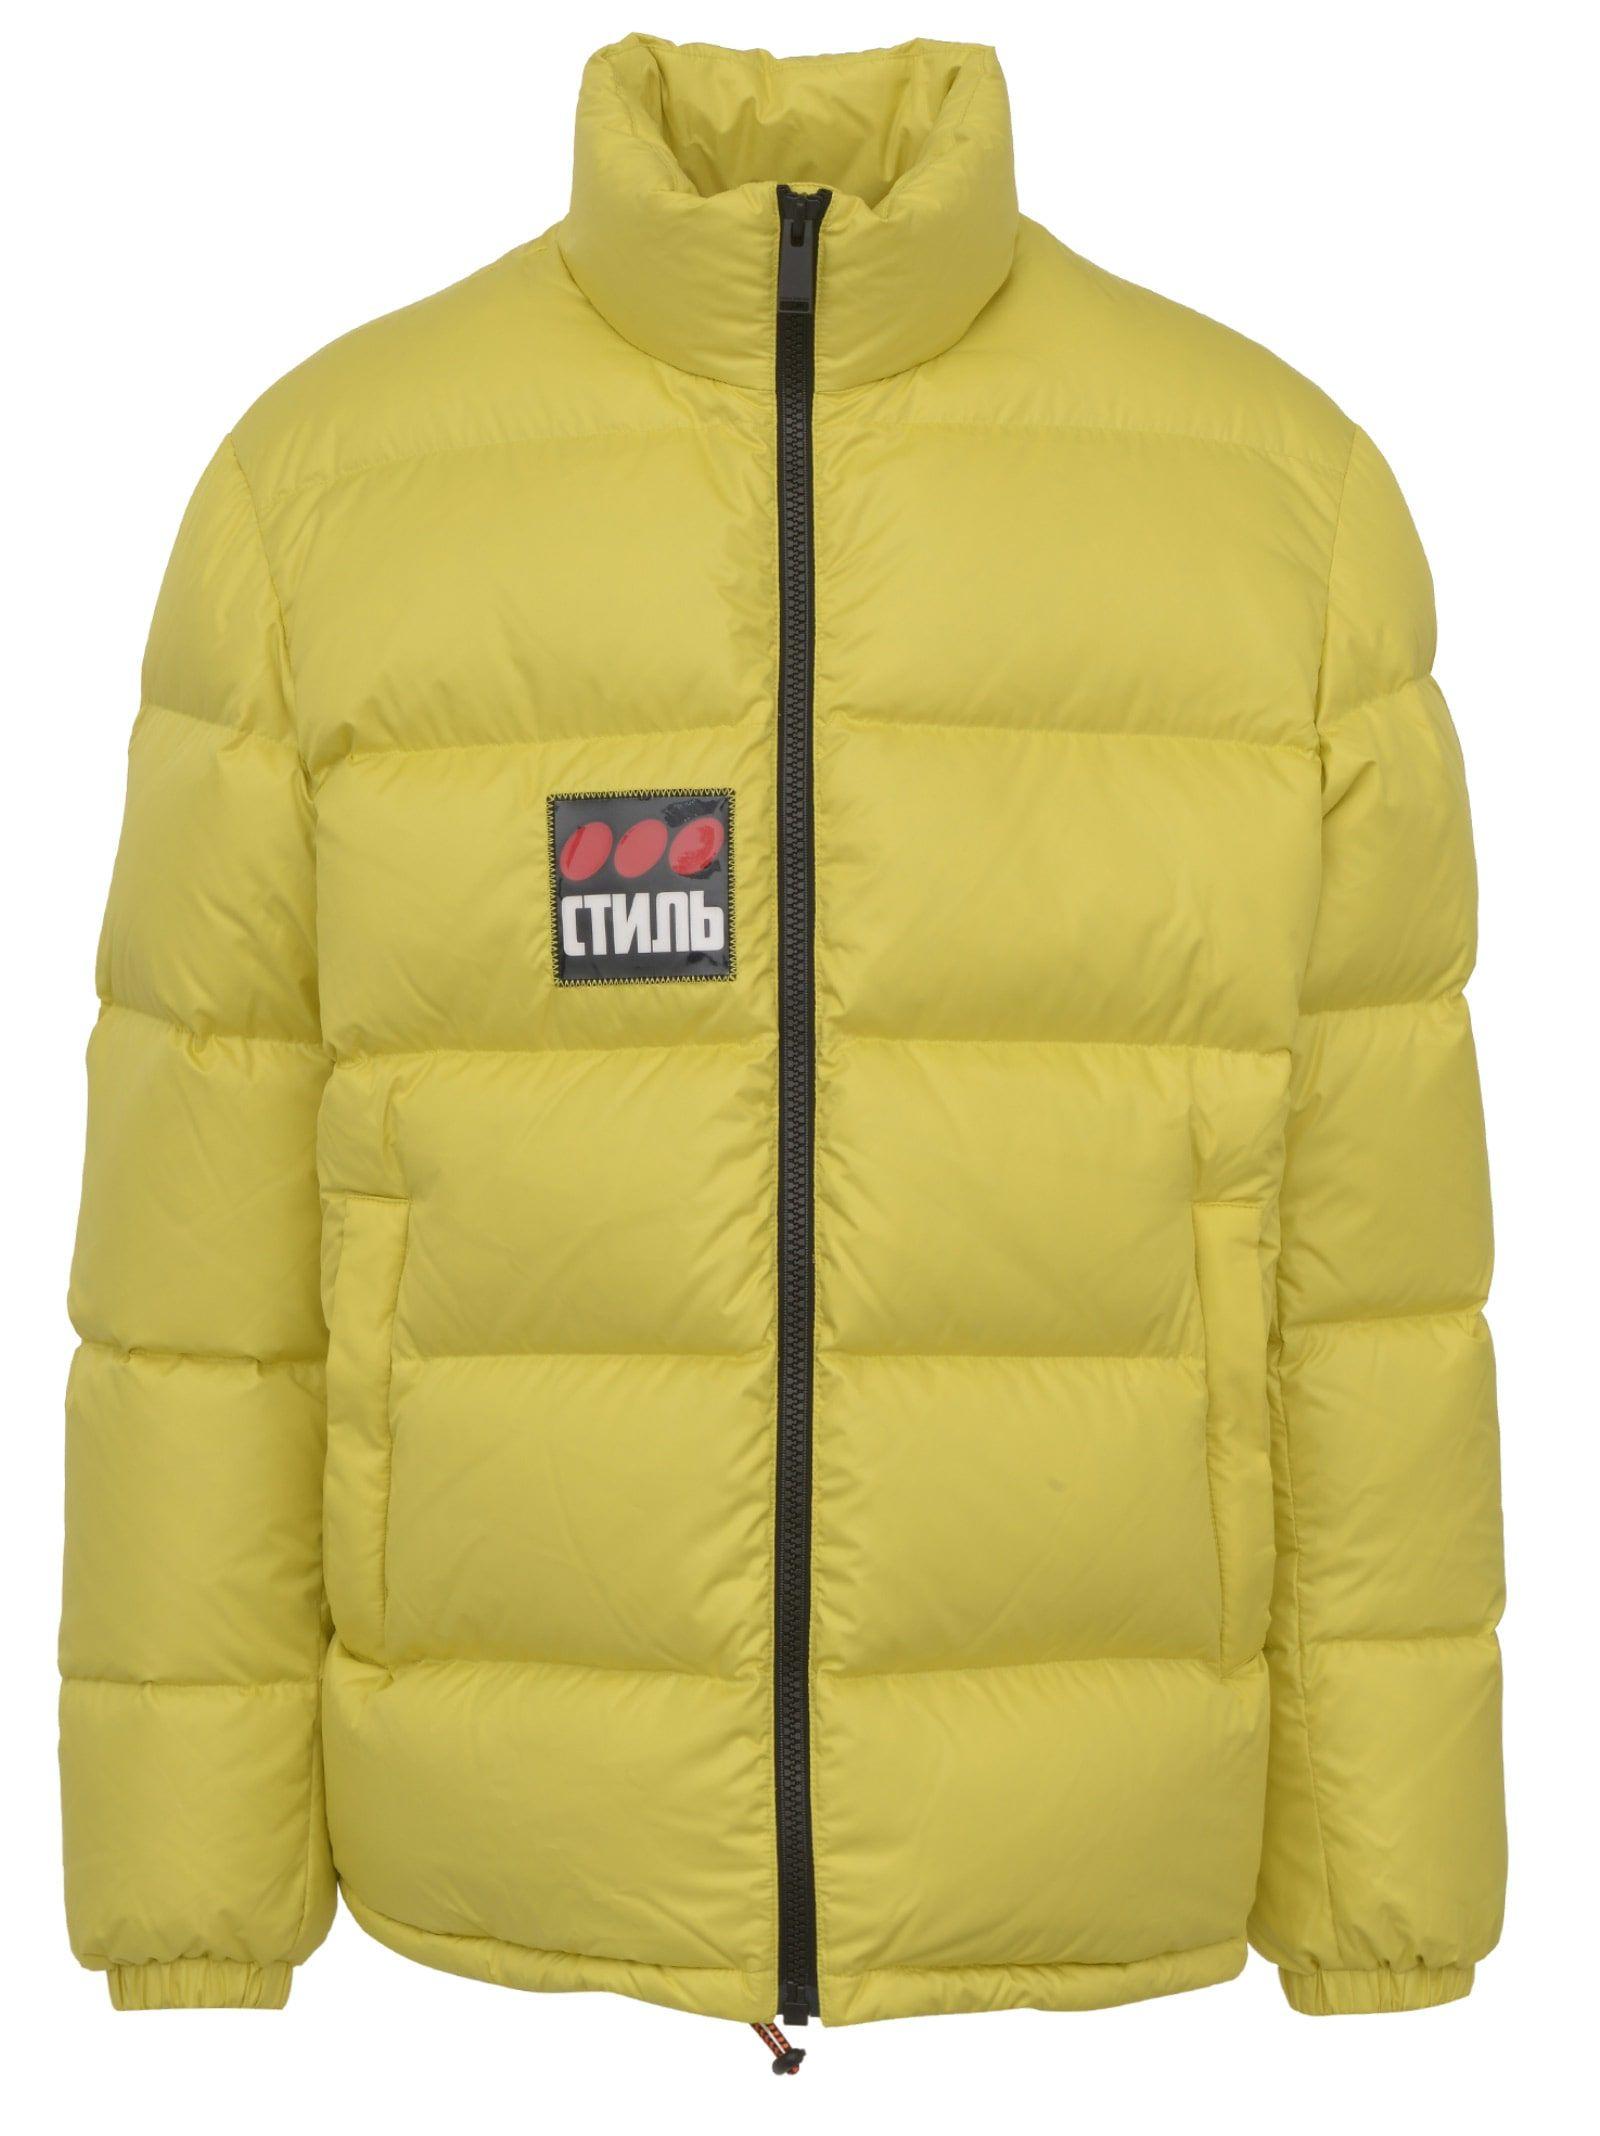 Heron Preston Logo Patch Puffer Jacket In Yellow Modesens Heron Preston Down Jacket Jackets [ 2136 x 1600 Pixel ]